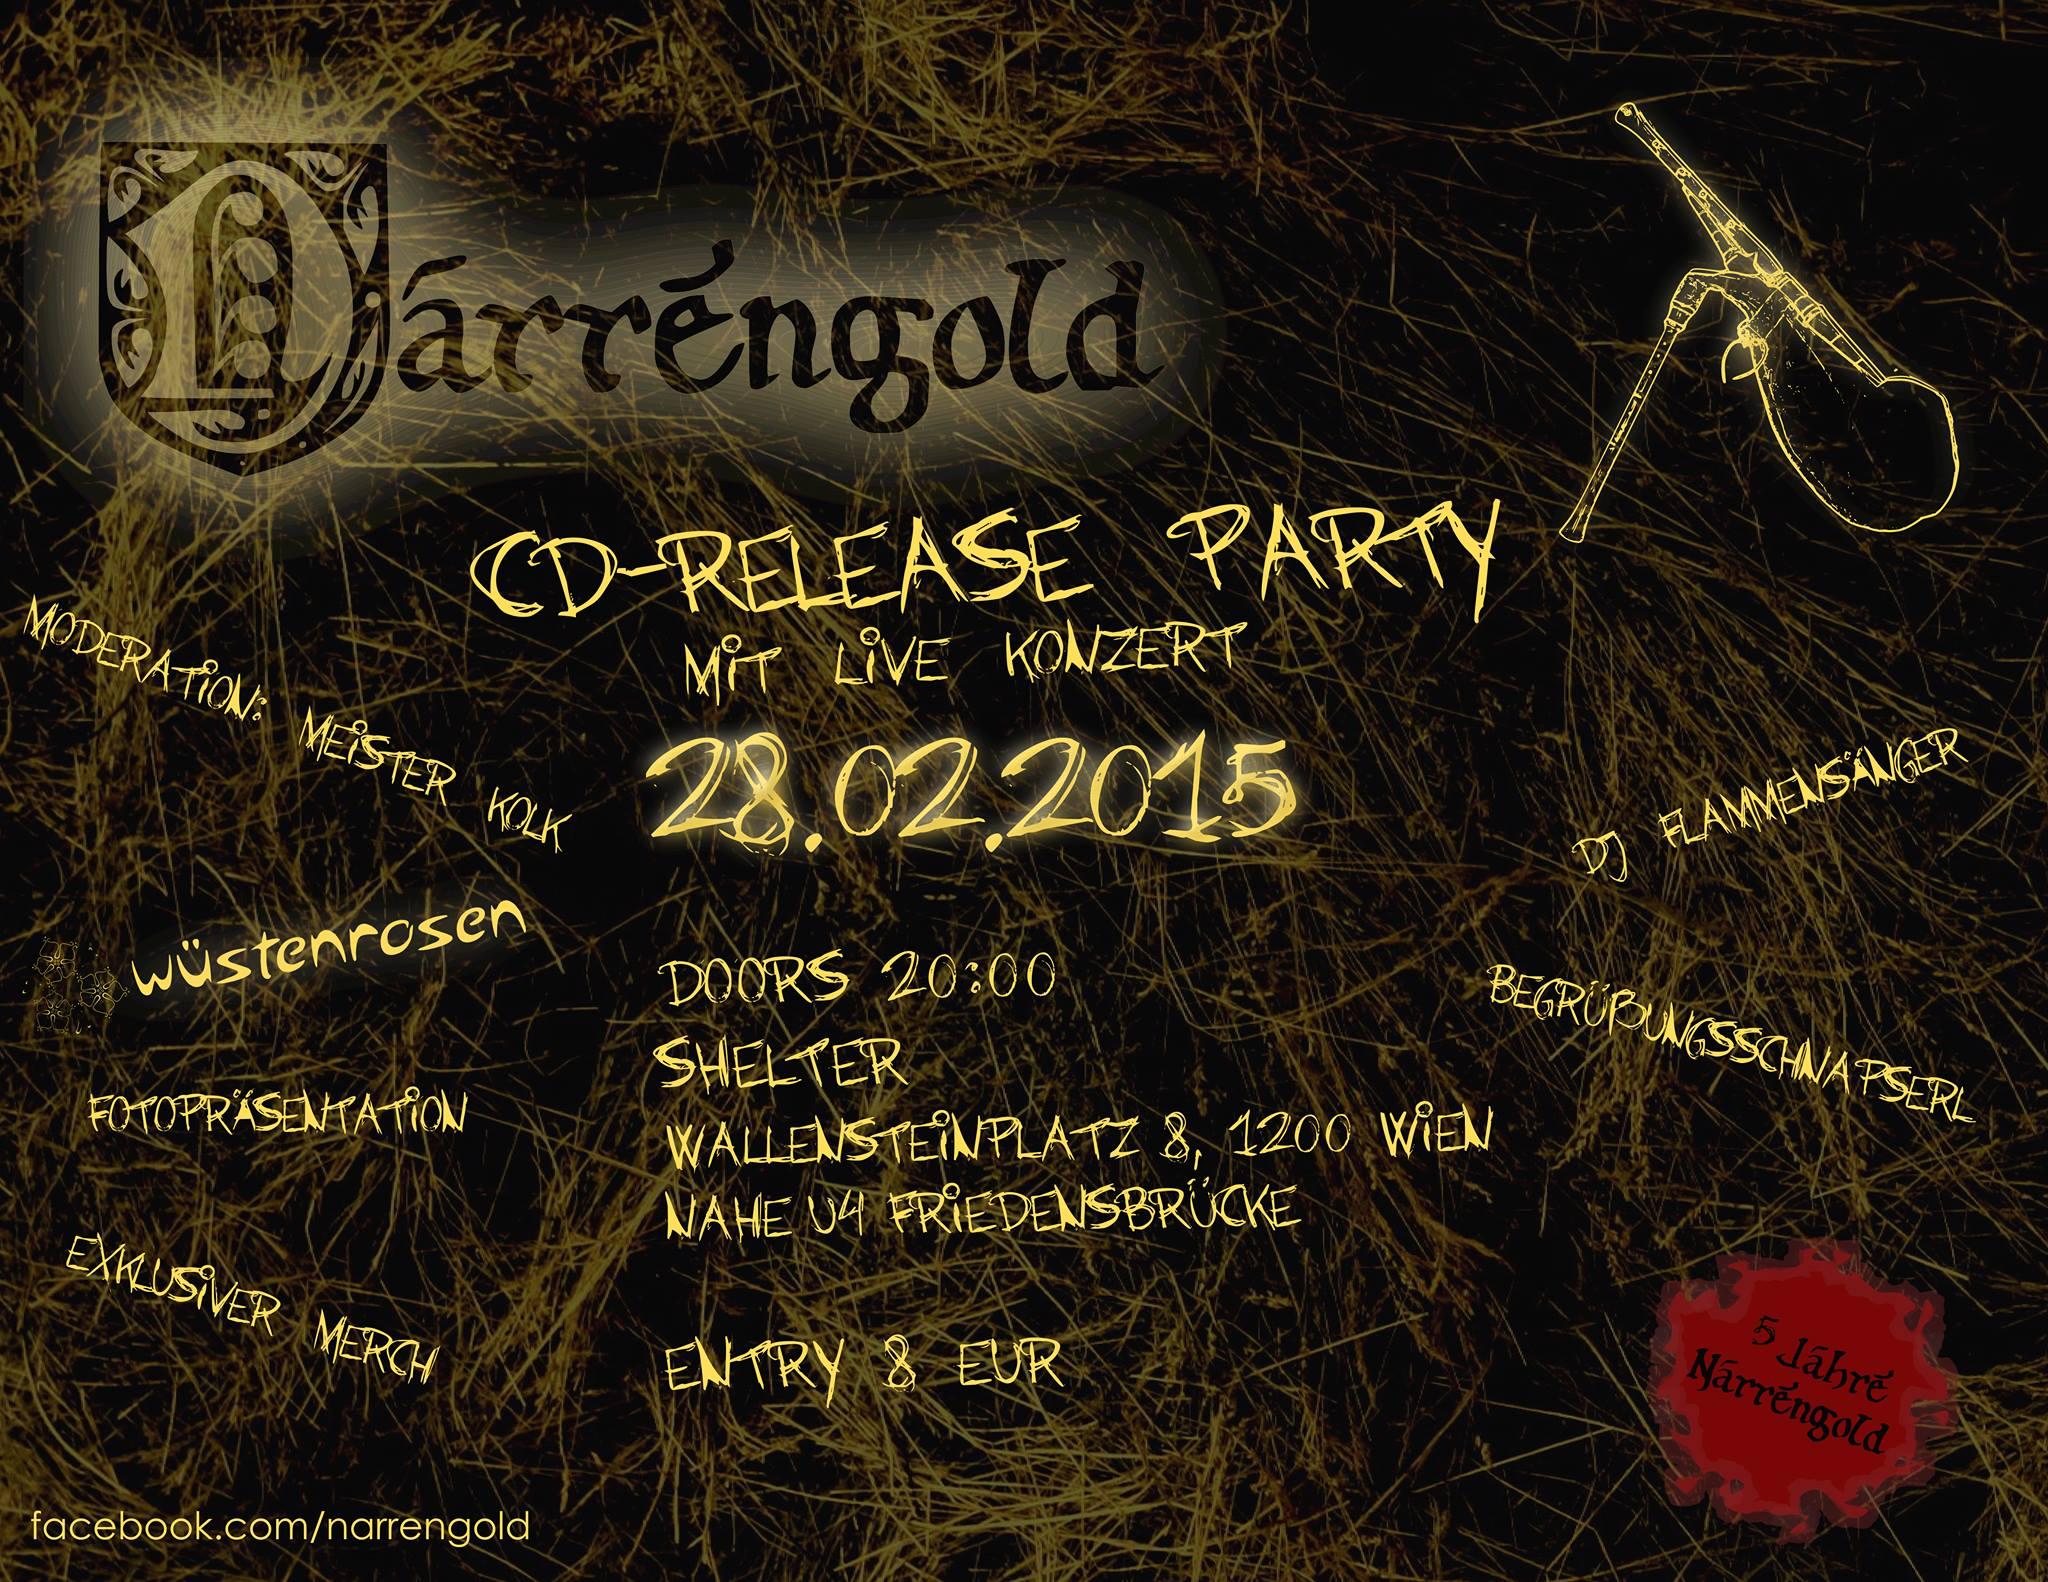 Narrengold CD-Release Party am 28. Februar 2015